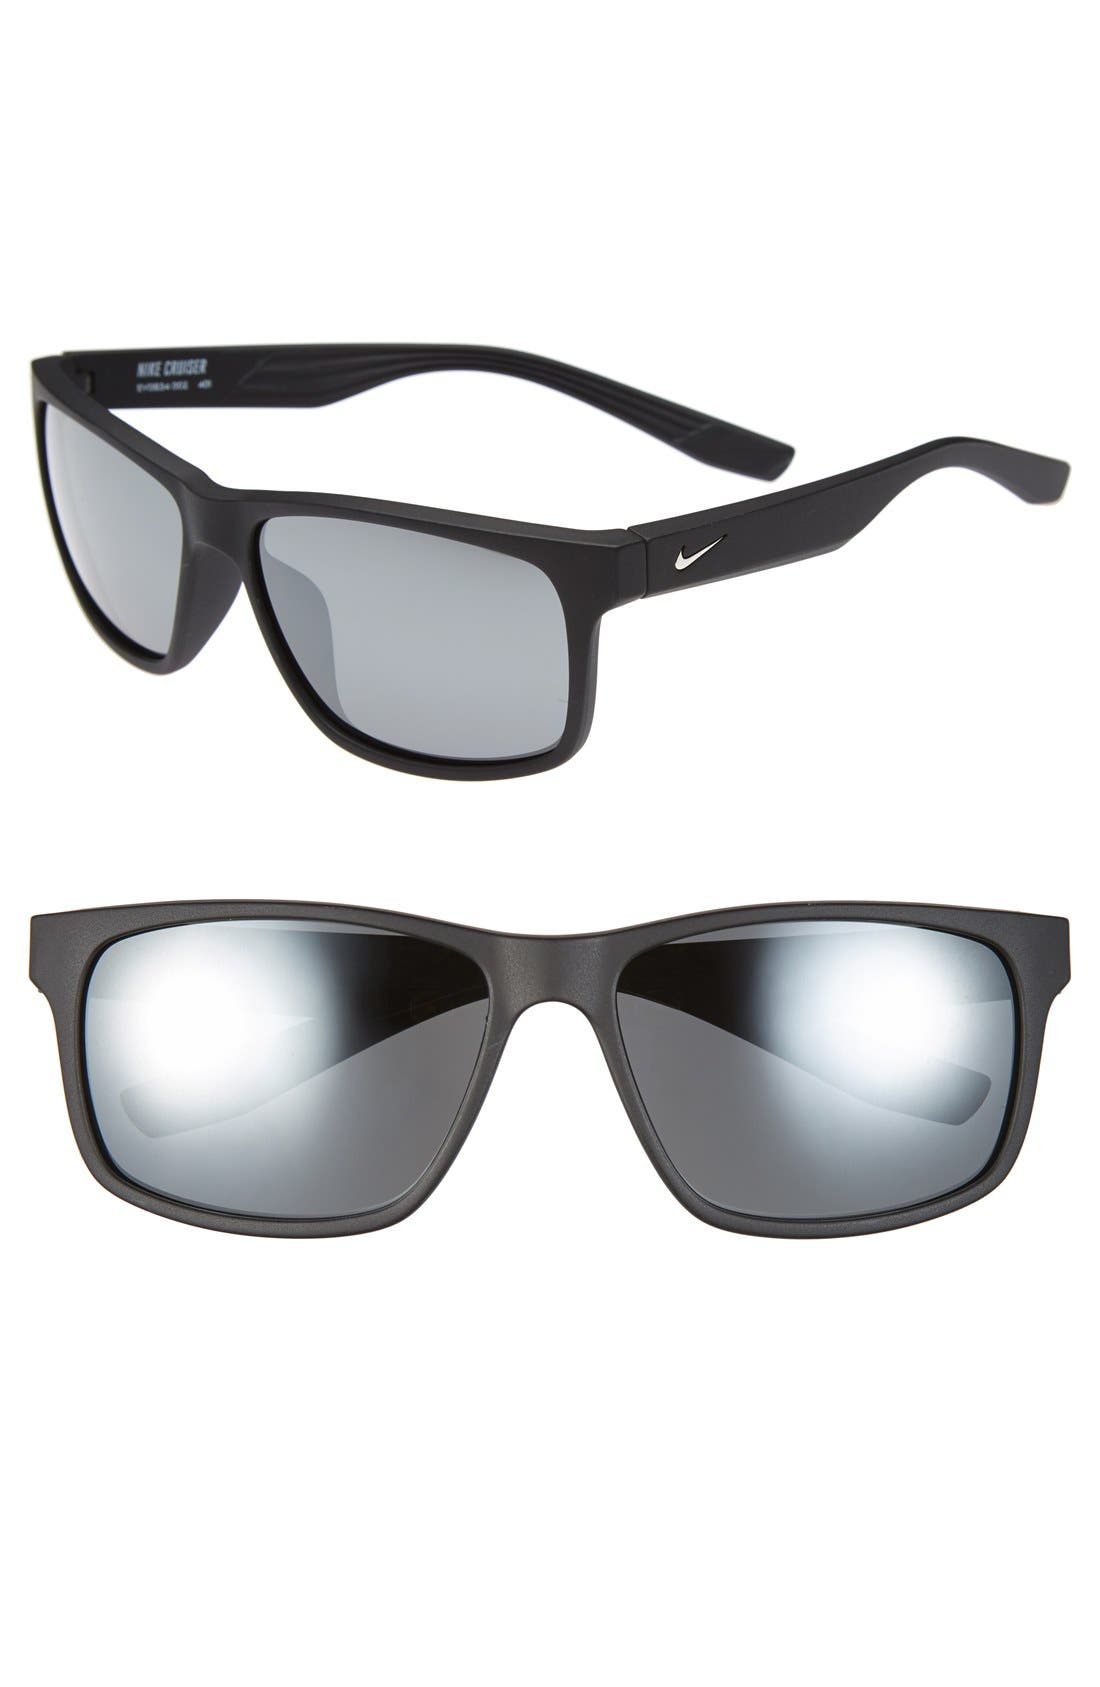 Nike 'Cruiser' 59mm Sunglasses